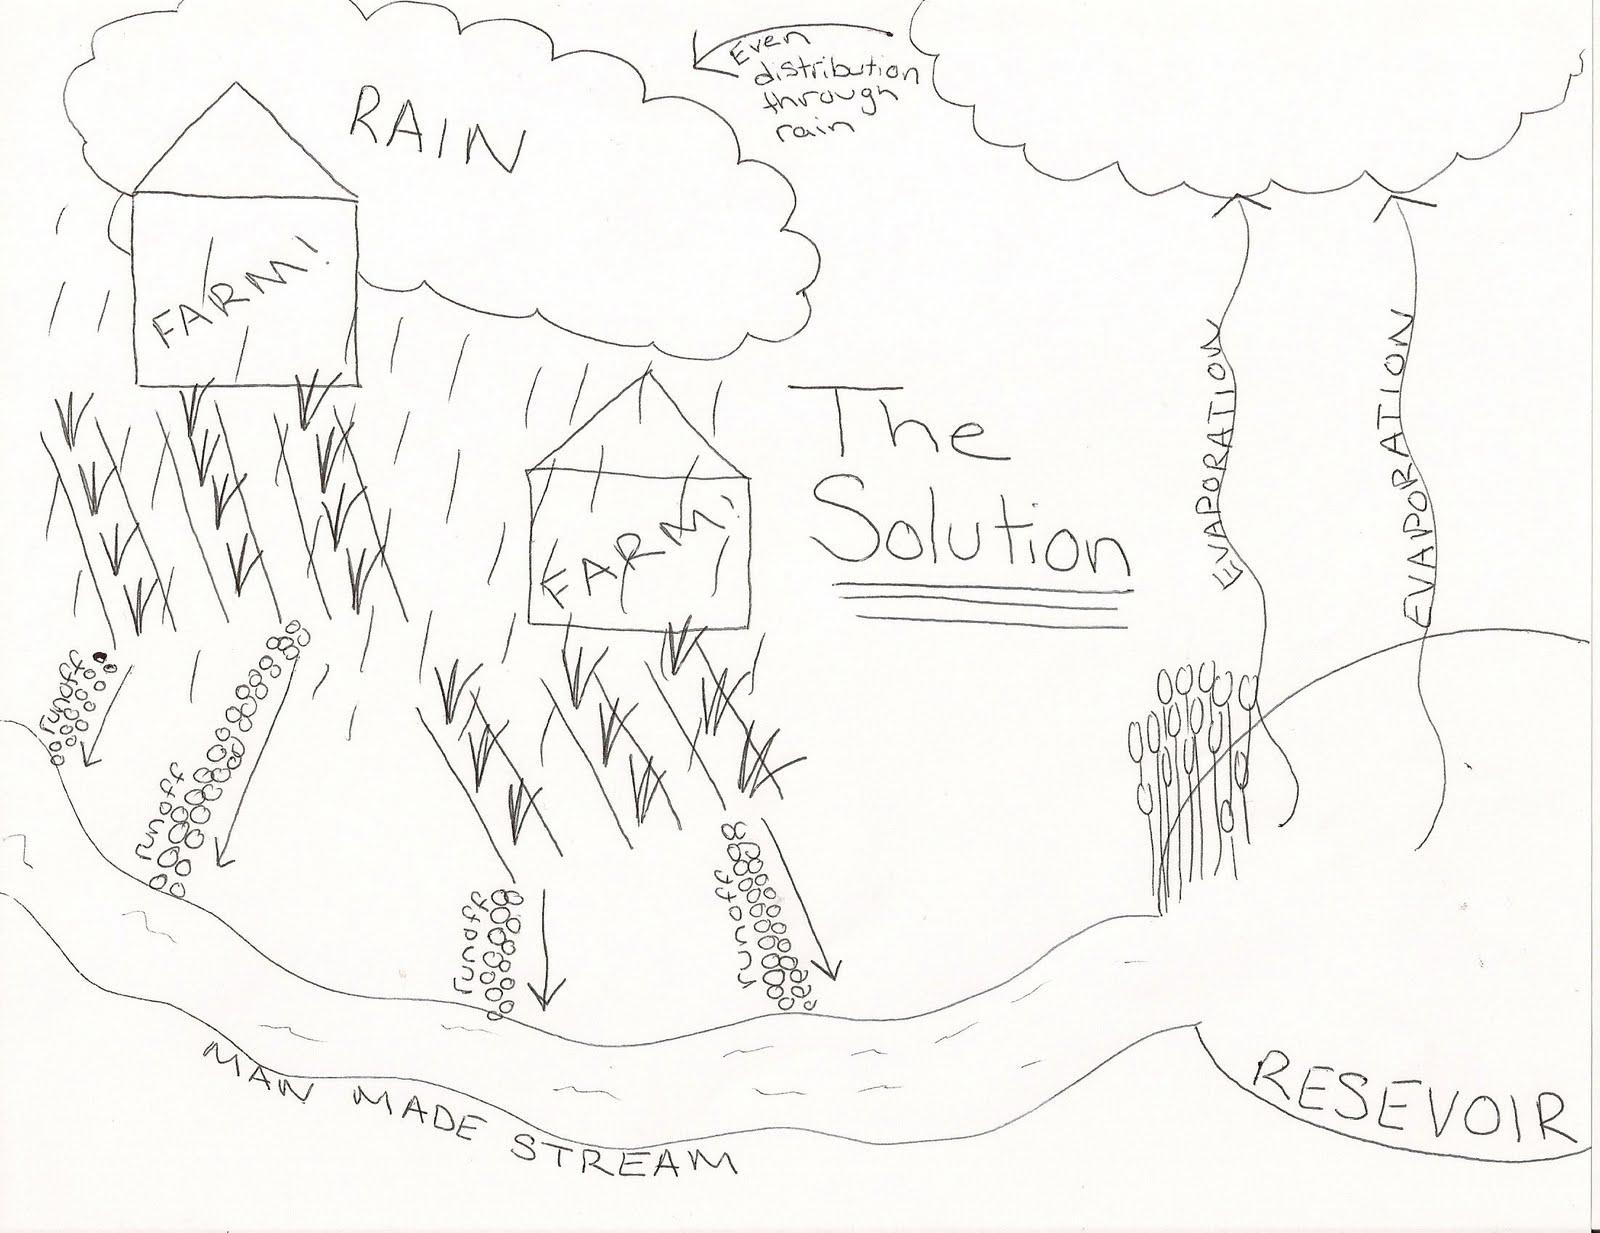 The Fertilizer Runoff Problem